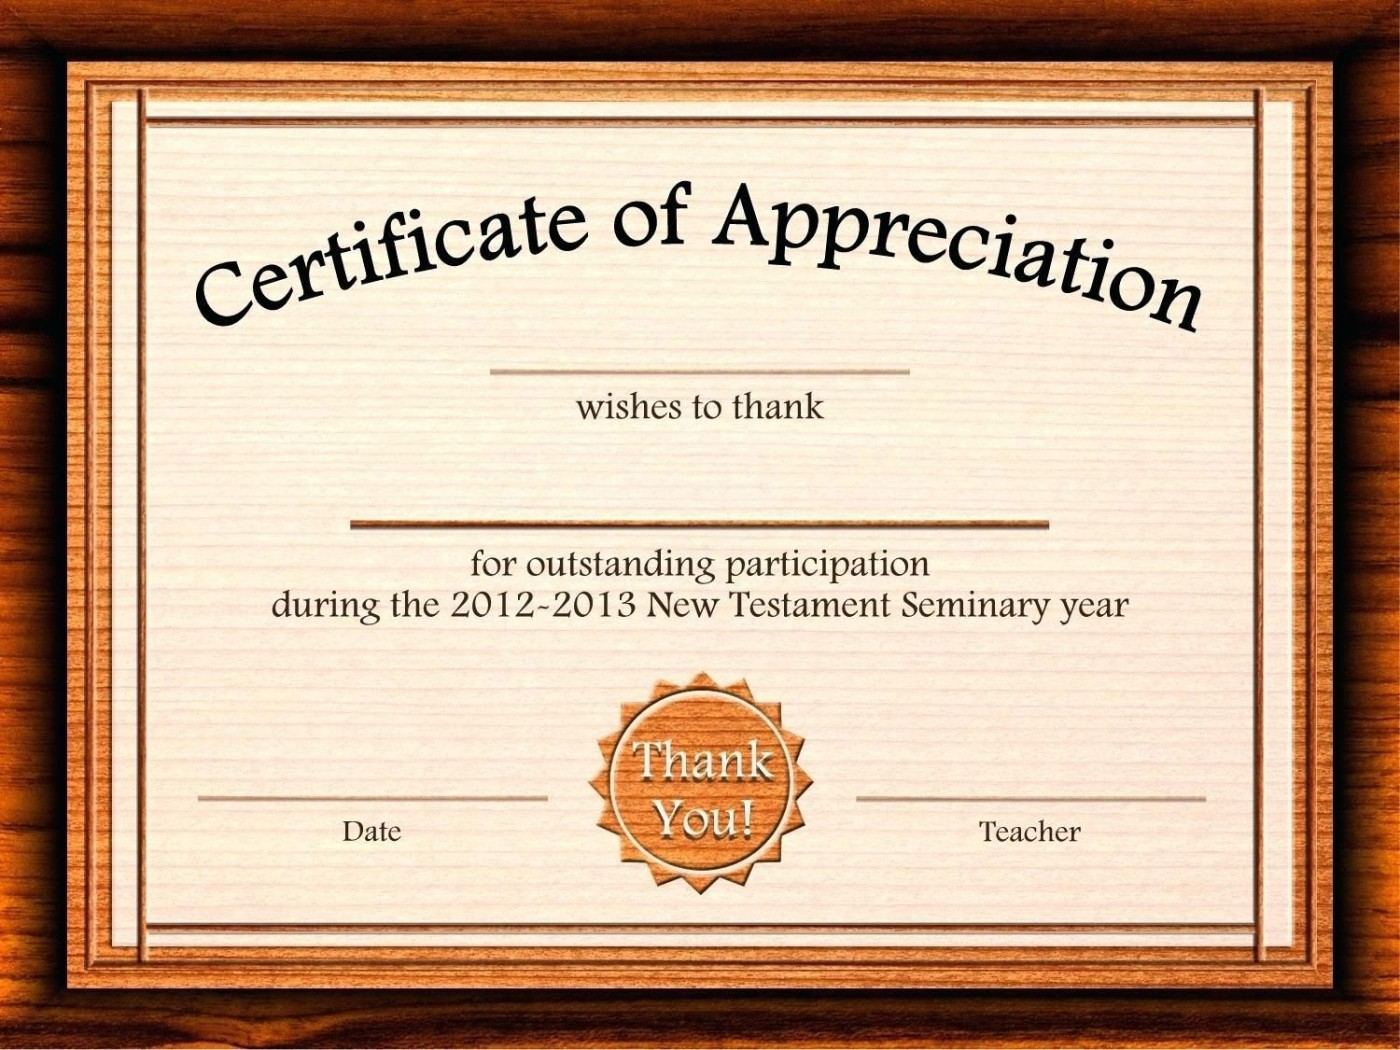 003 Awful Certificate Of Award Template Word Free Photo 1400